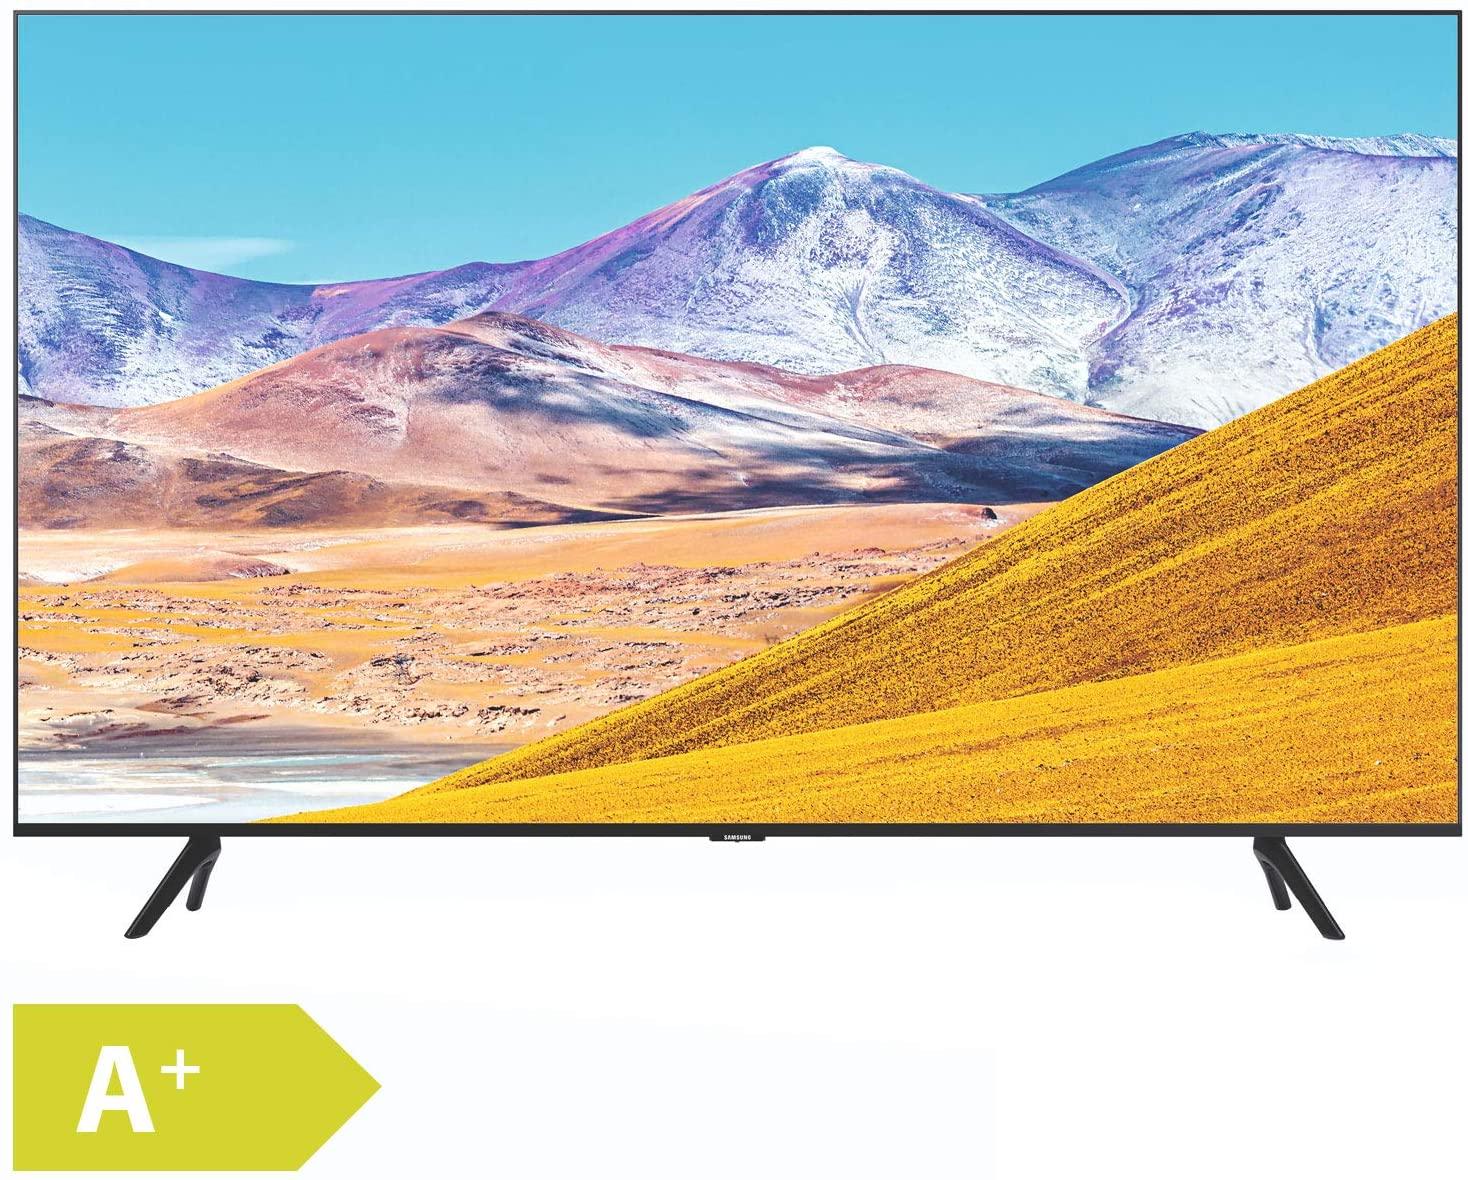 [Mediamarkt] SAMSUNG GU75TU8079 LED TV (Flat, 75 Zoll / 189 cm, UHD 4K, SMART TV)